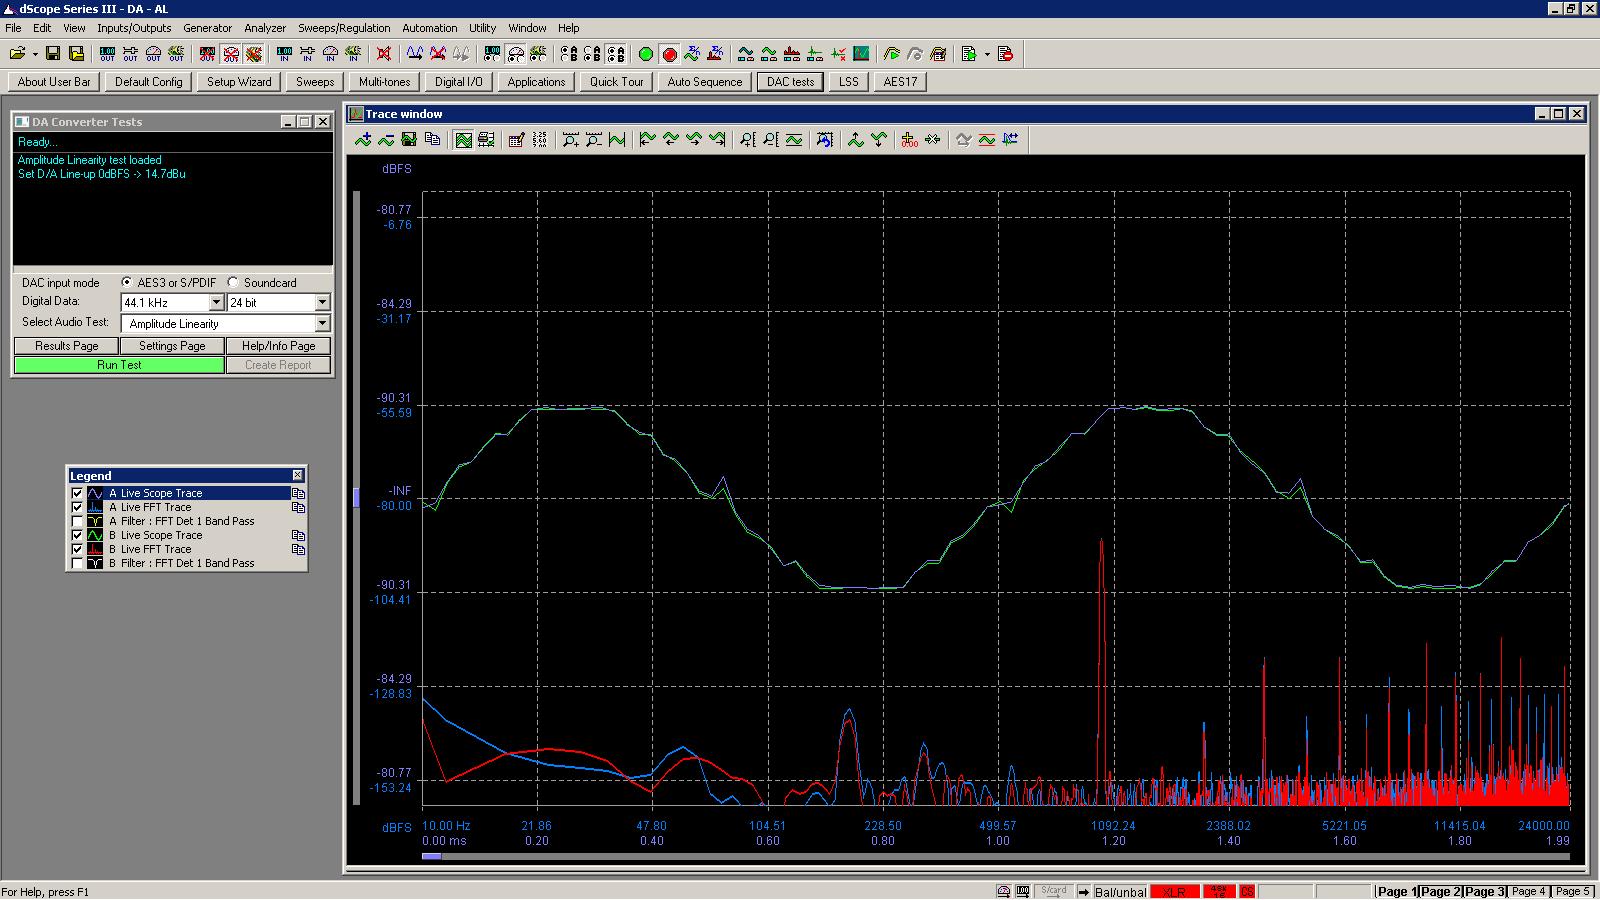 1-20150926 Gungnir MB Bal 1 KHz -90 dBFS optical.PNG